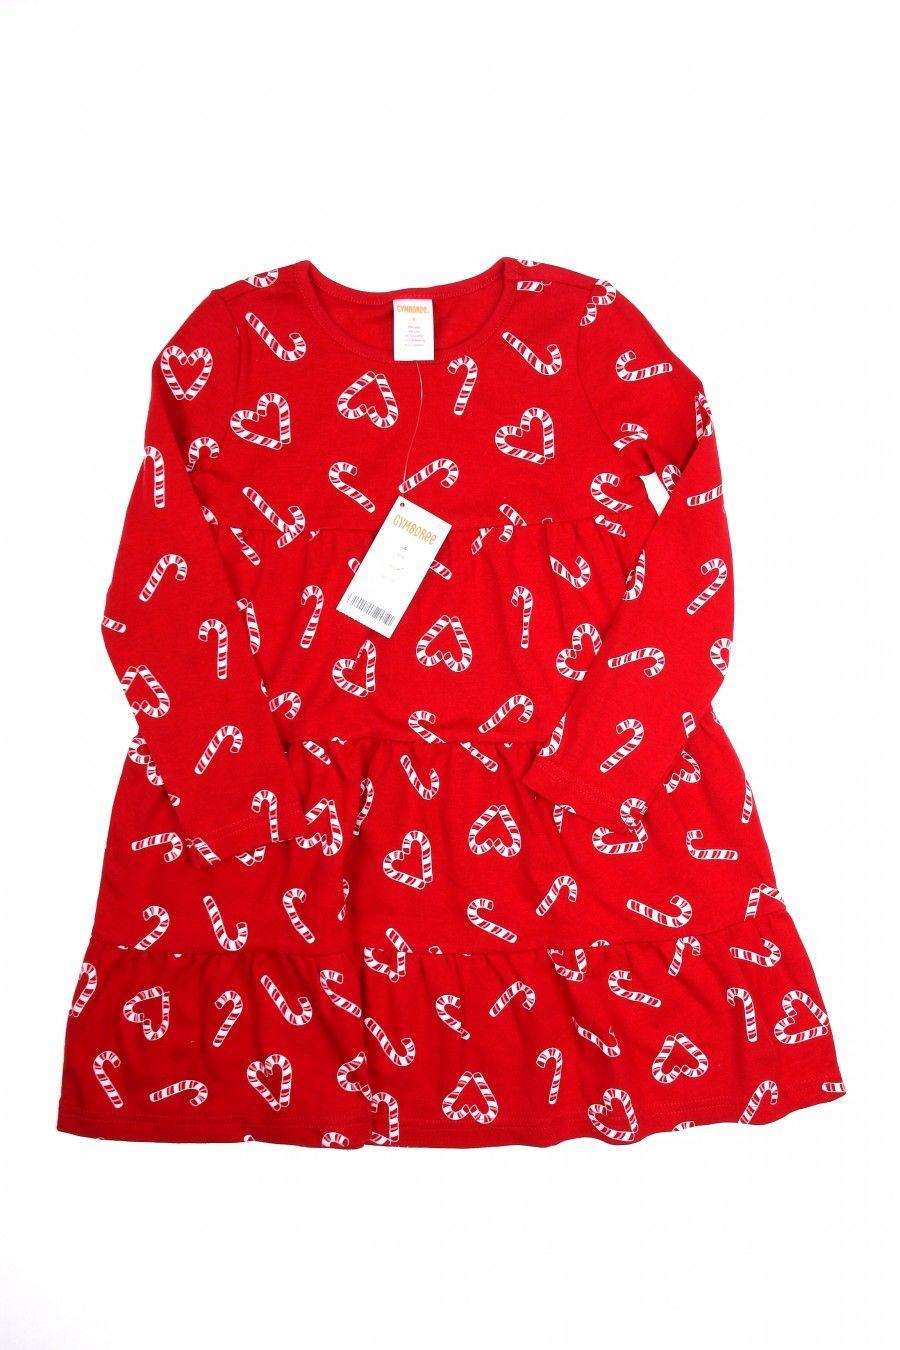 Girls gymboree short dress size xs christmas candycane kids